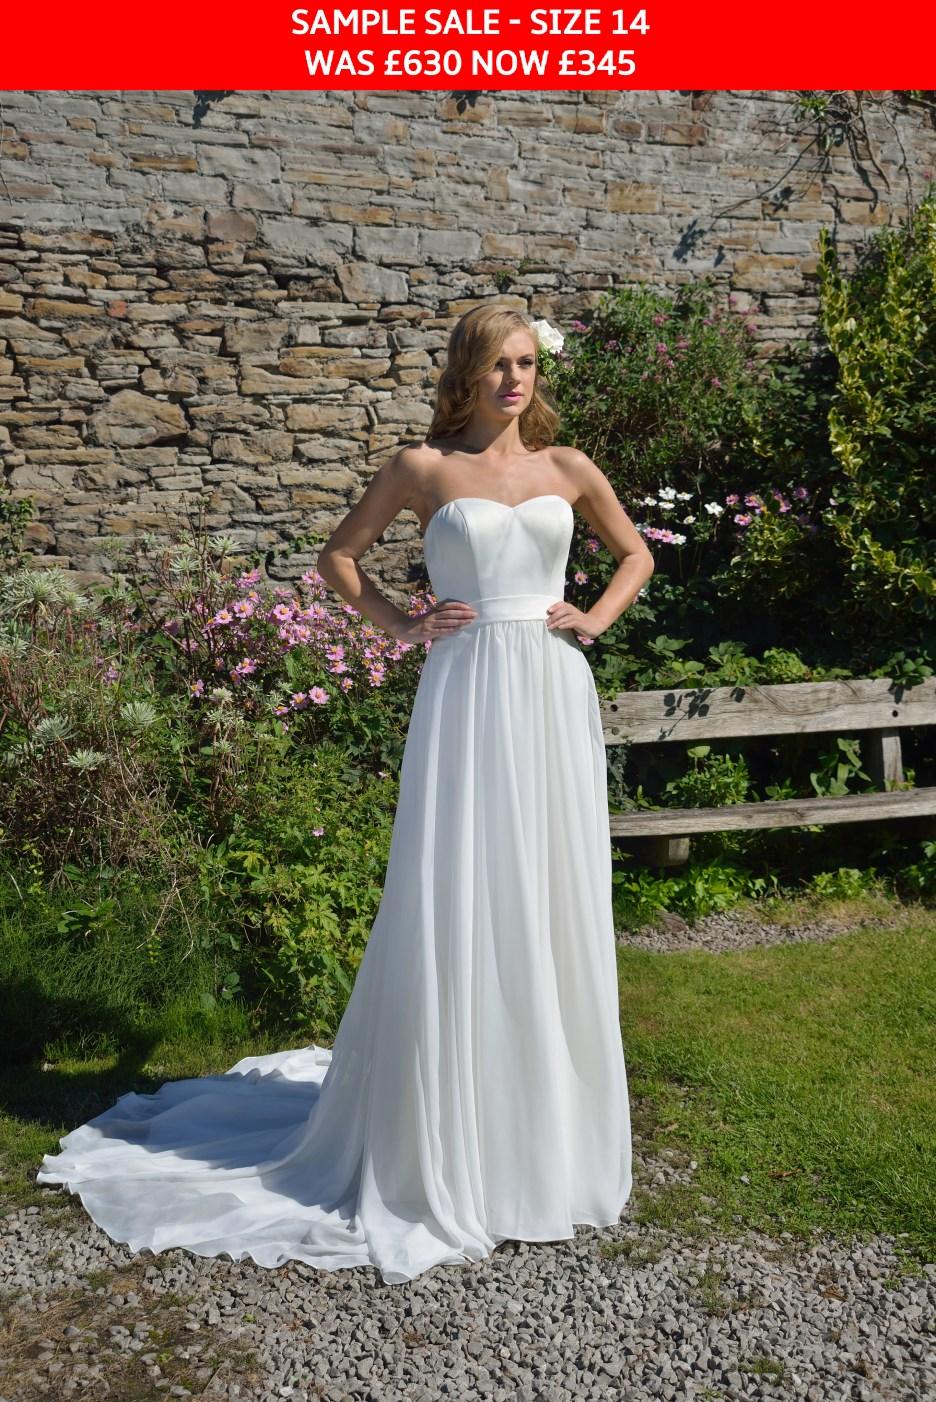 Catherine Parry CPCD23 wedding dress sample sale